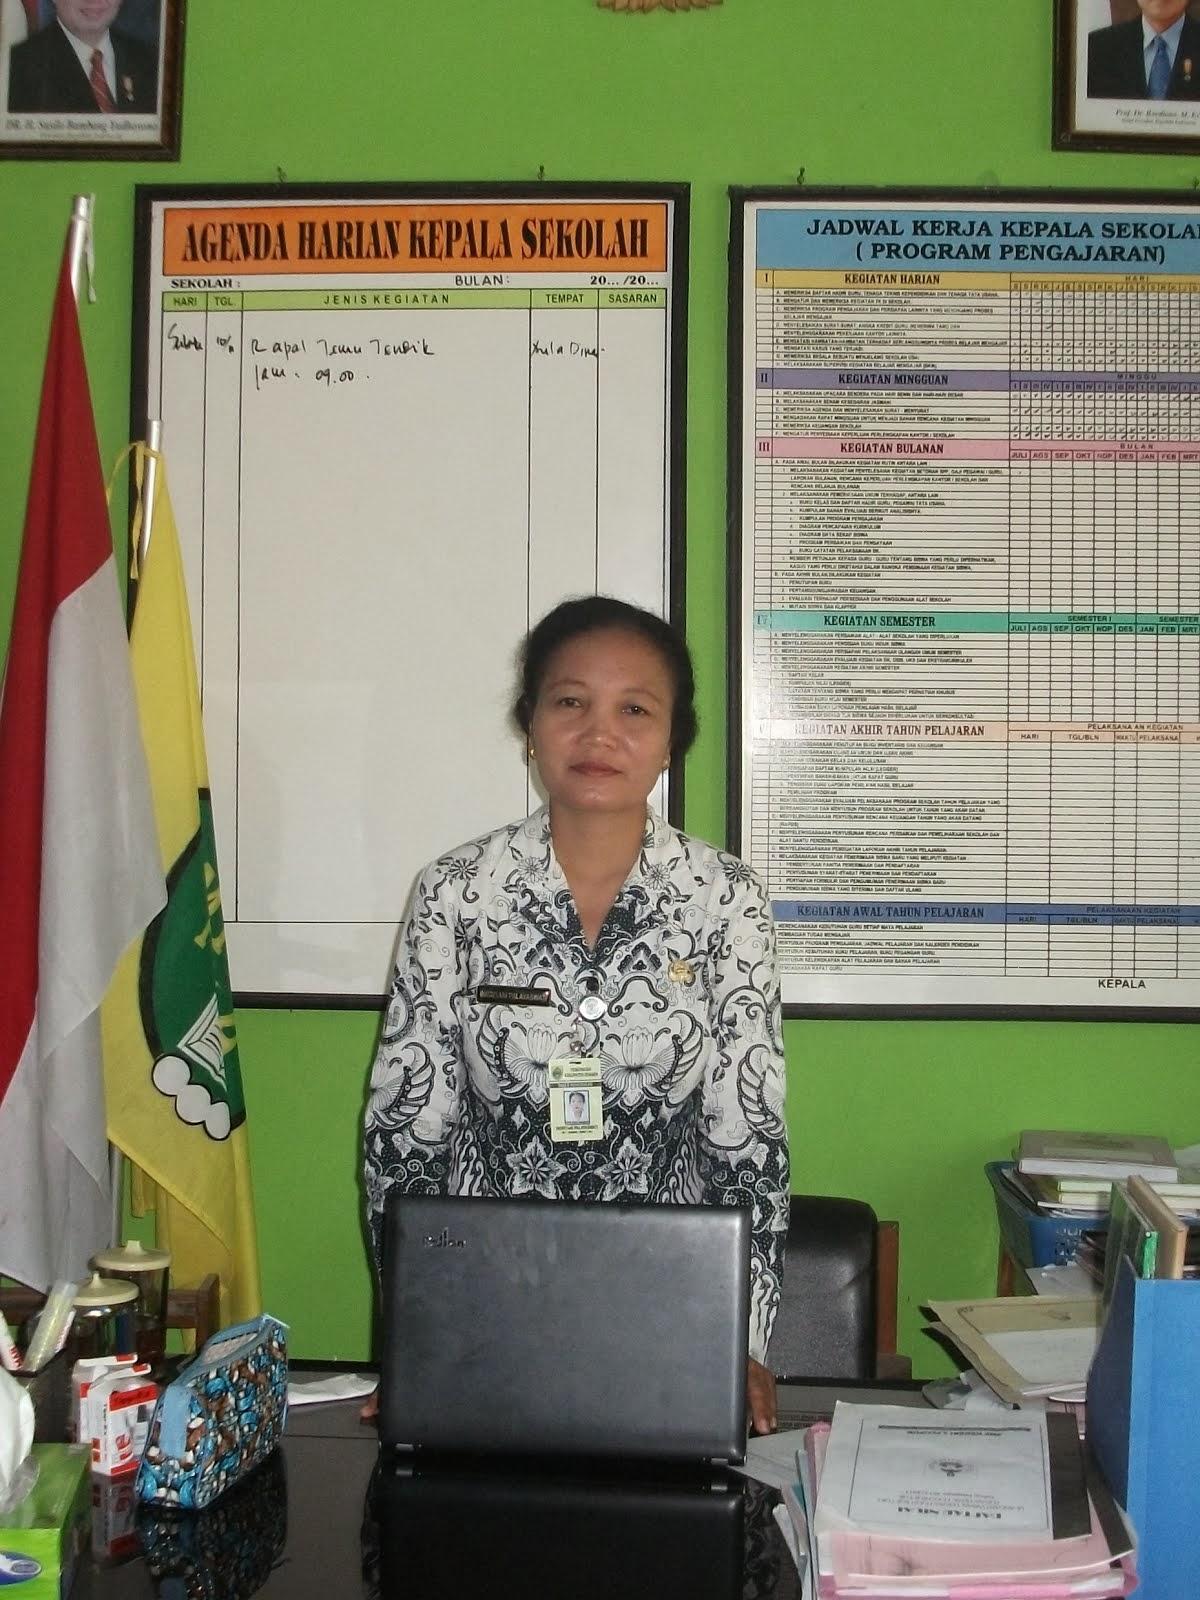 Kepala SMP Negeri 2 Plupuh Tahun 2012 - Sekarang